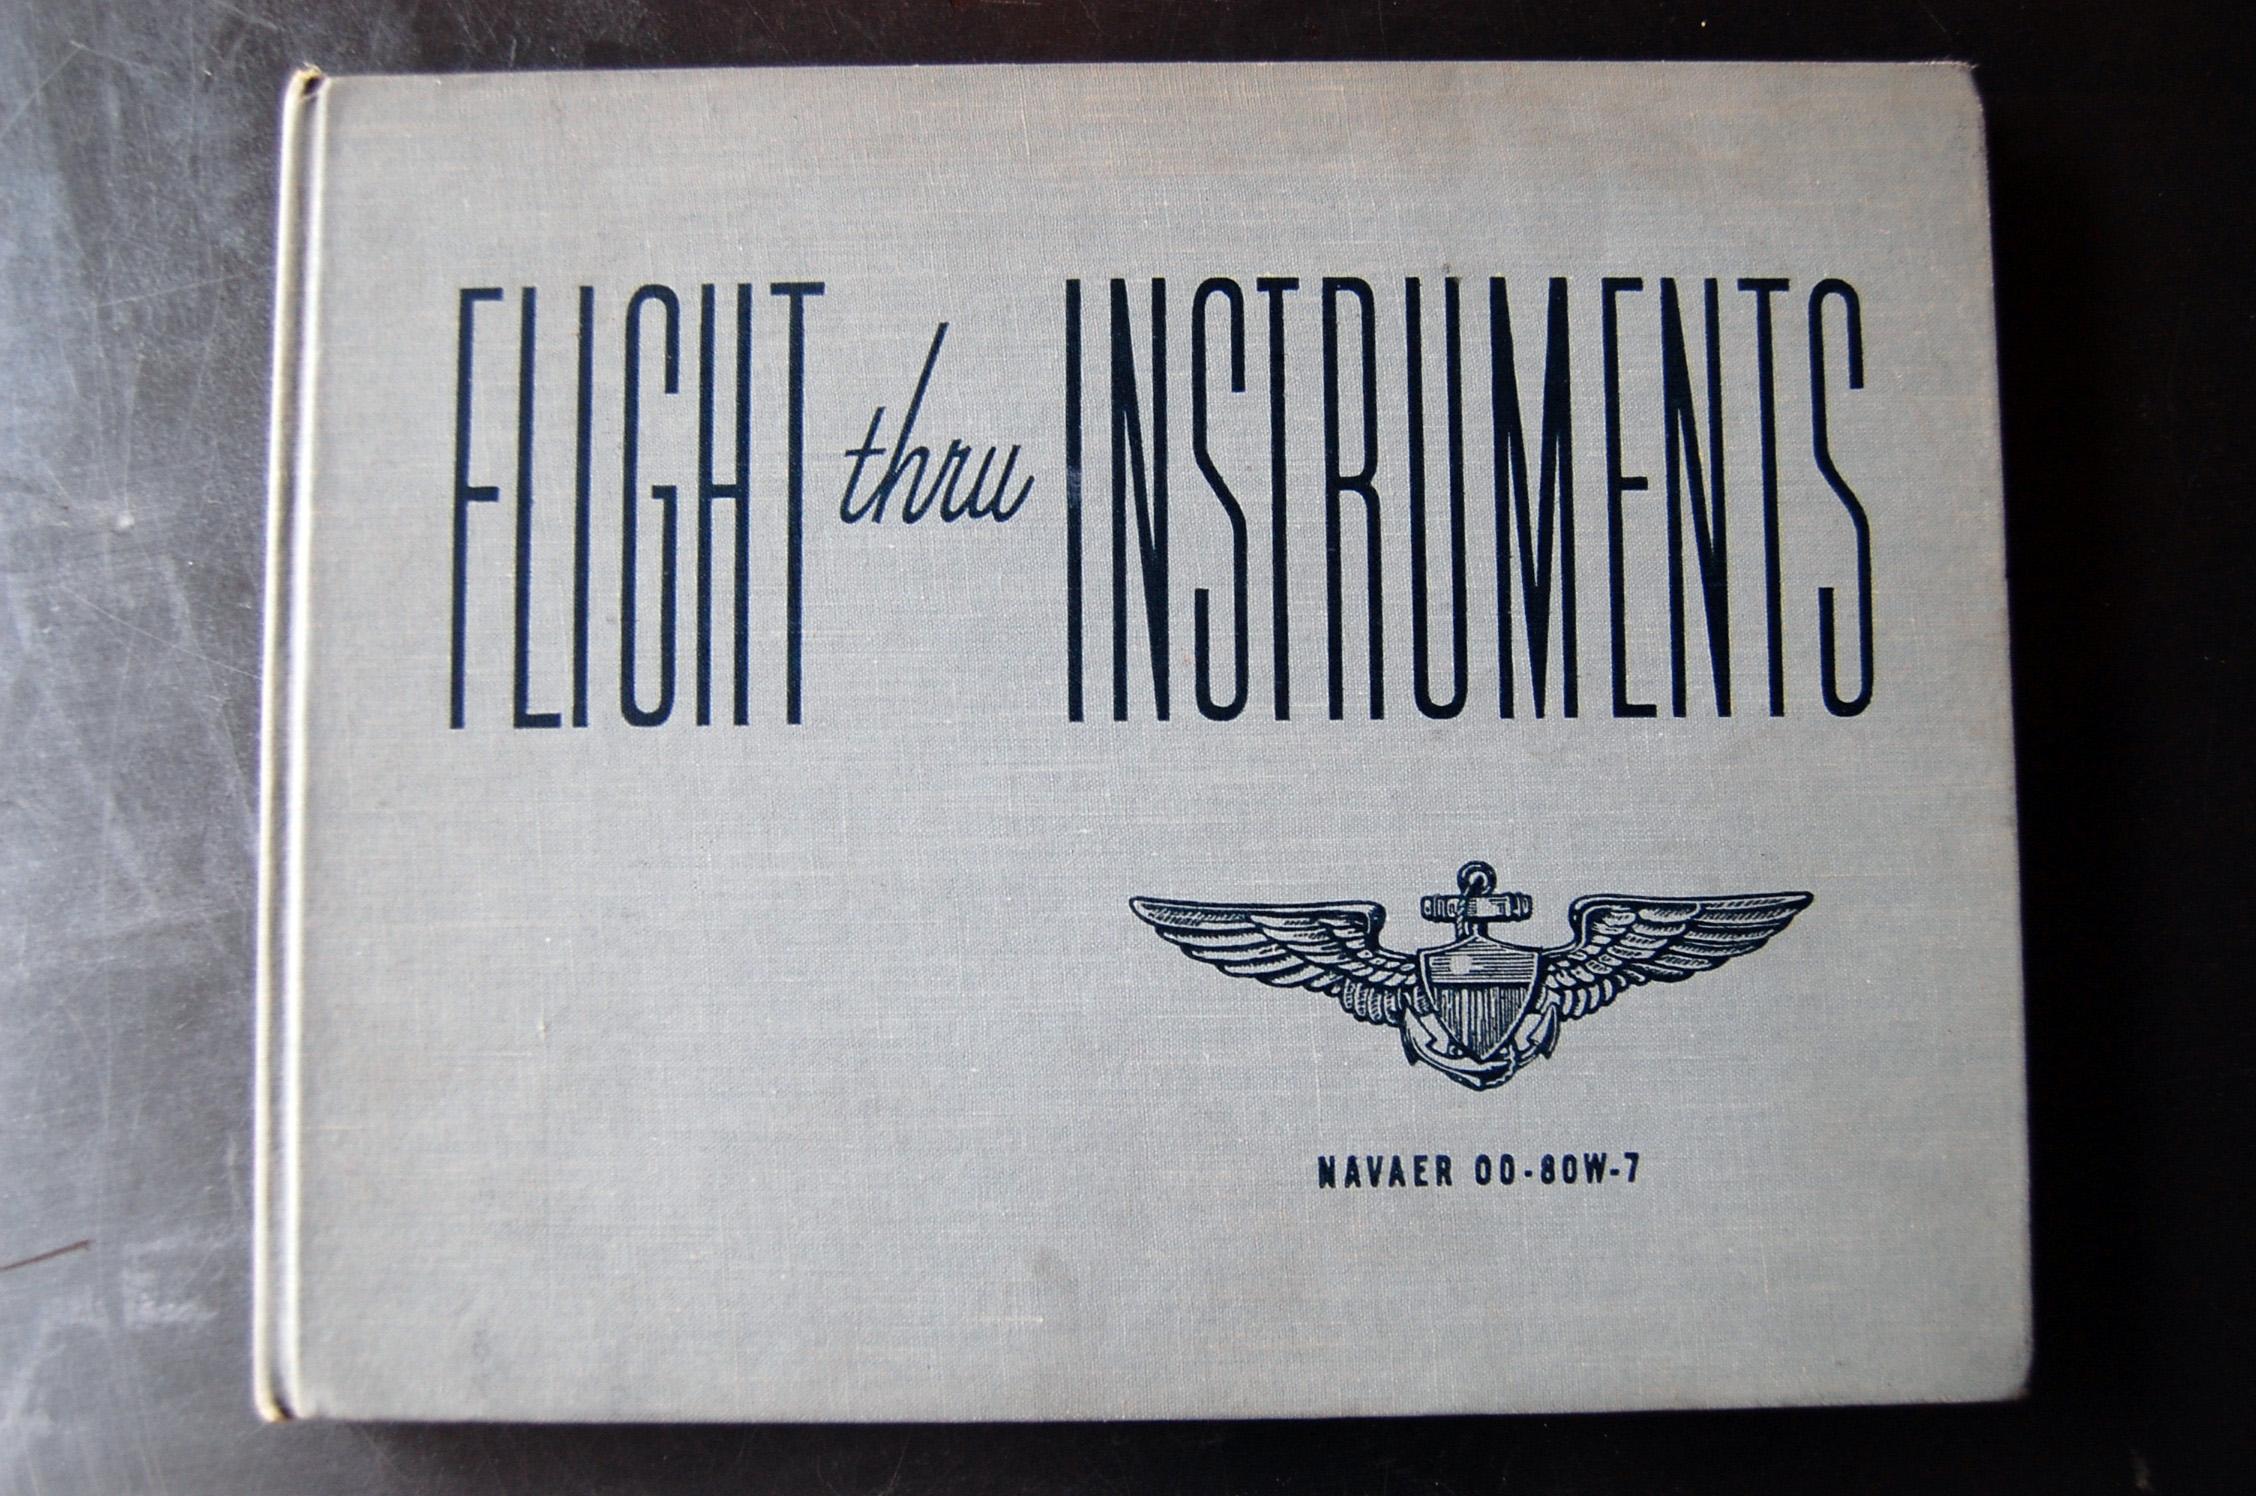 Flight Thru Instruments Manual Front Cover